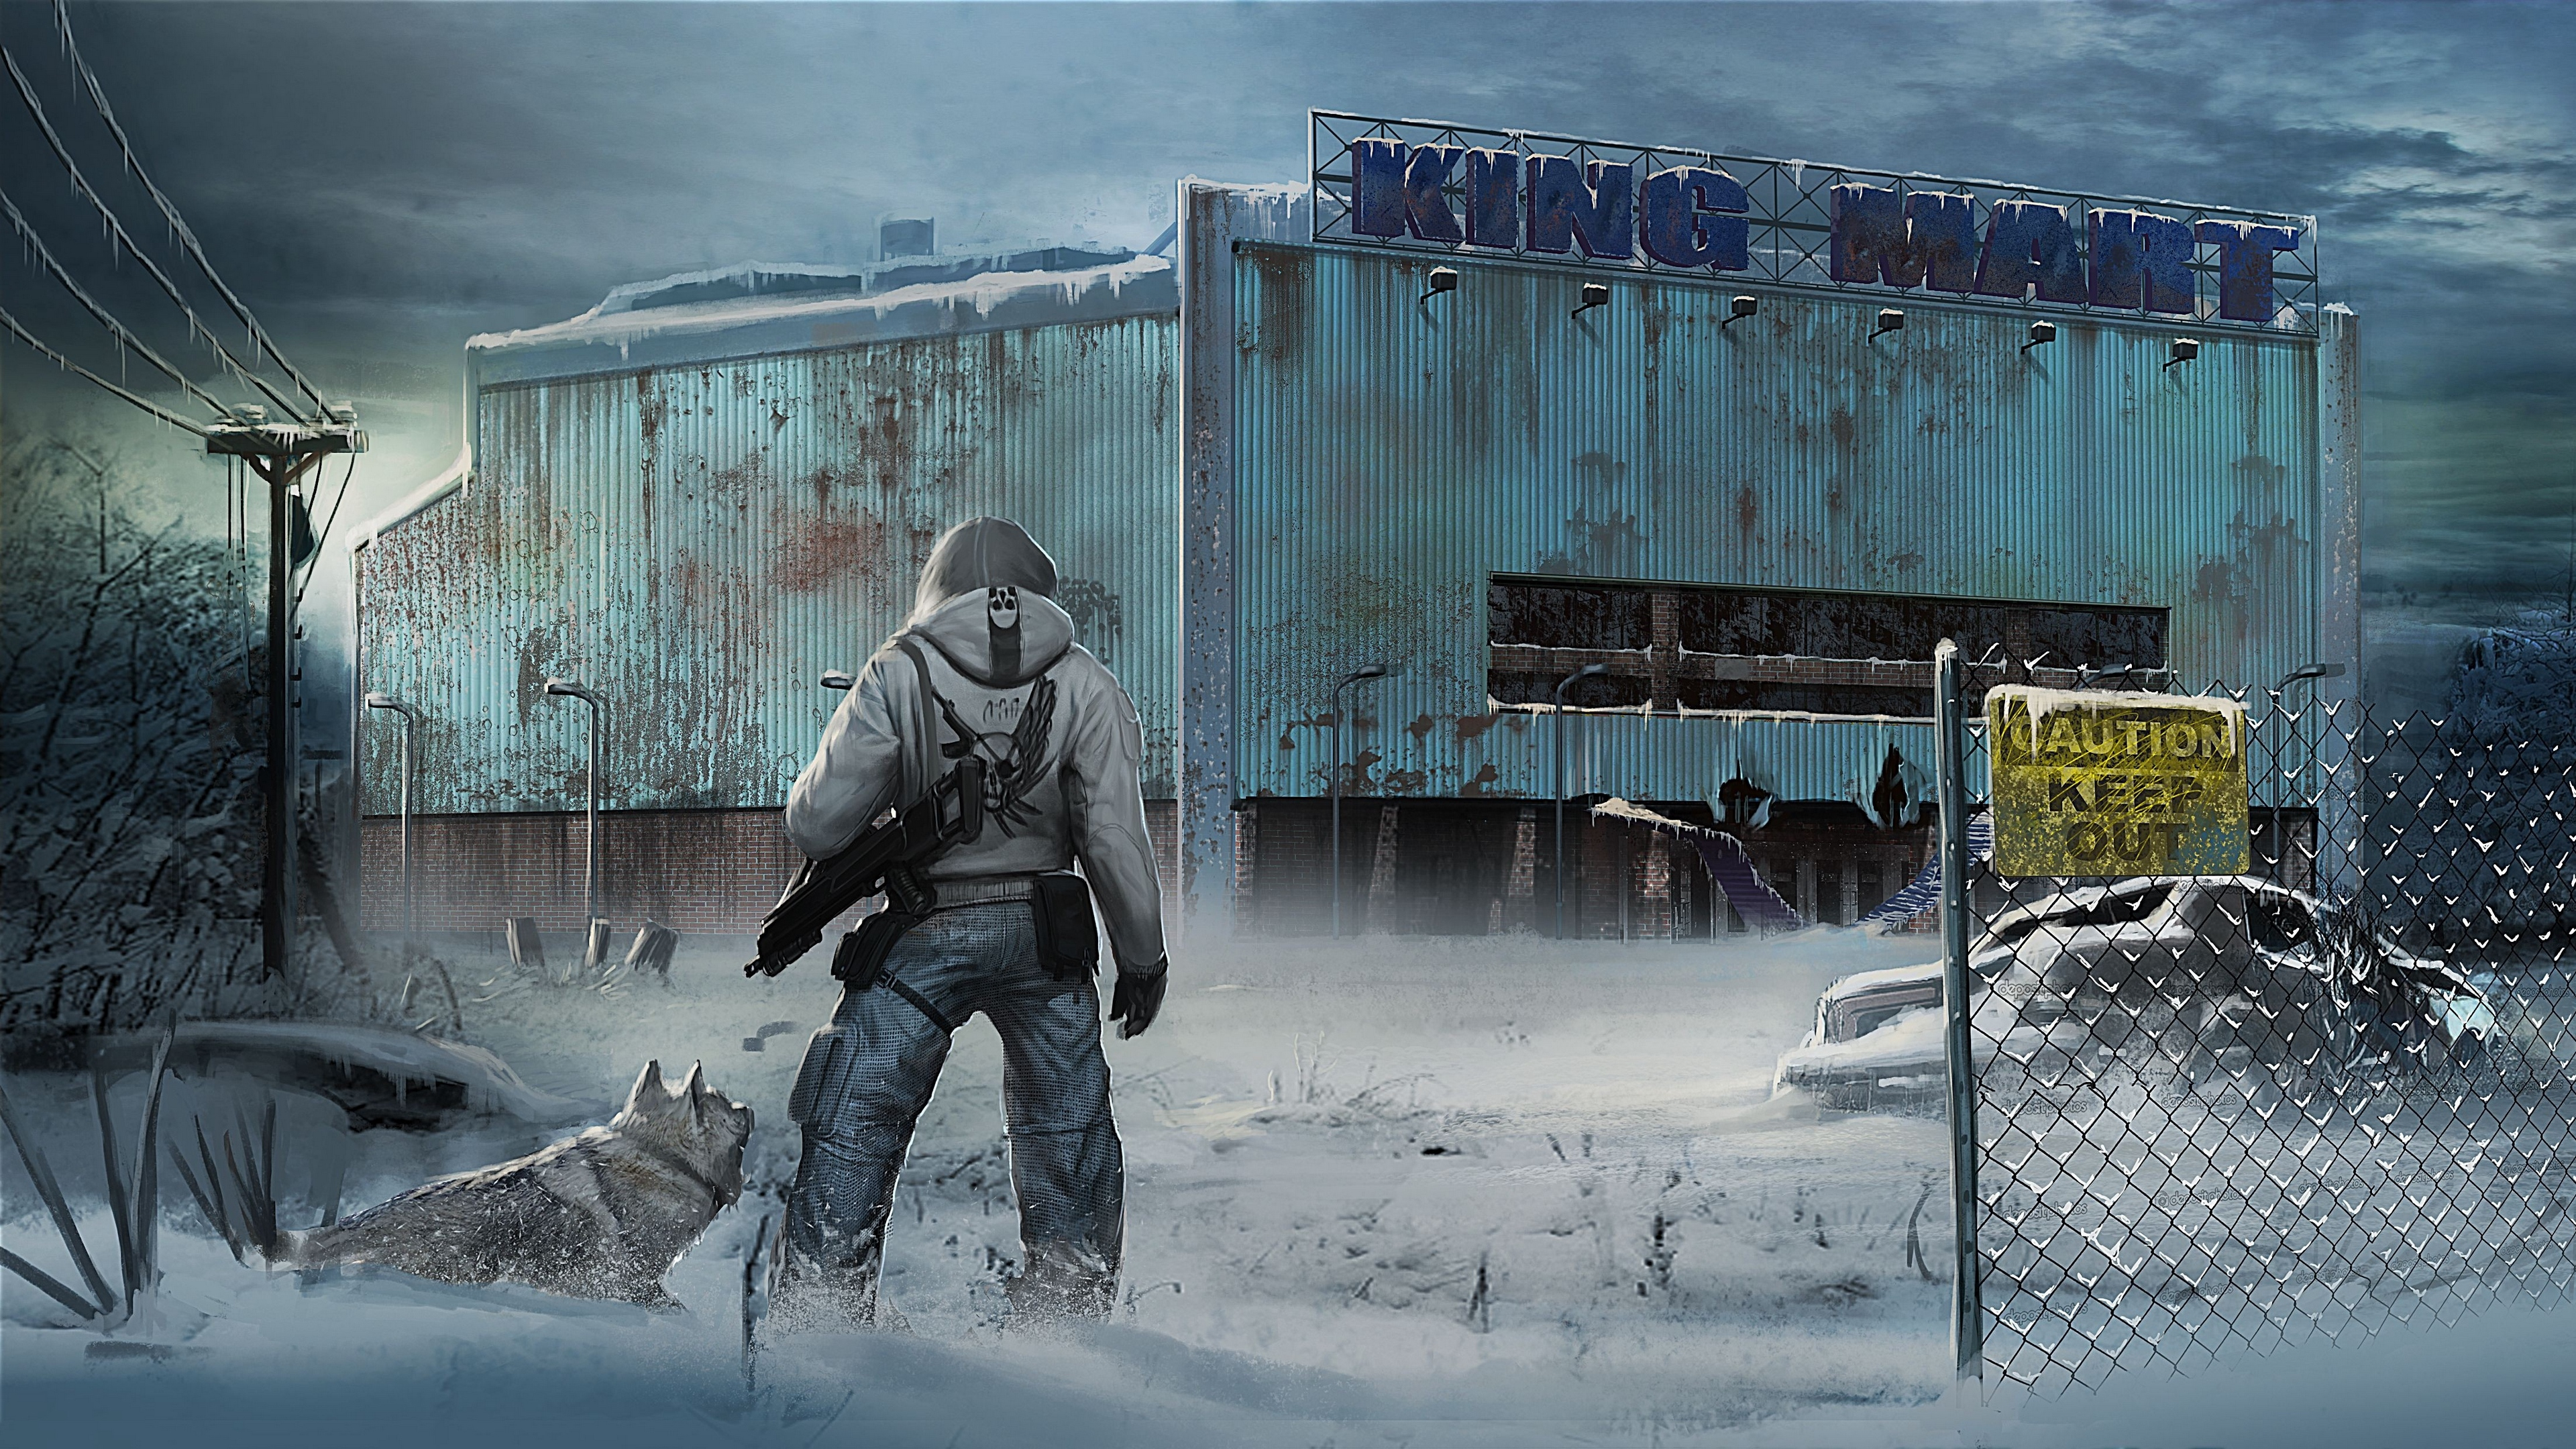 Wallpaper 4k The Last Of Us City Winter 4k City The Last Of Us